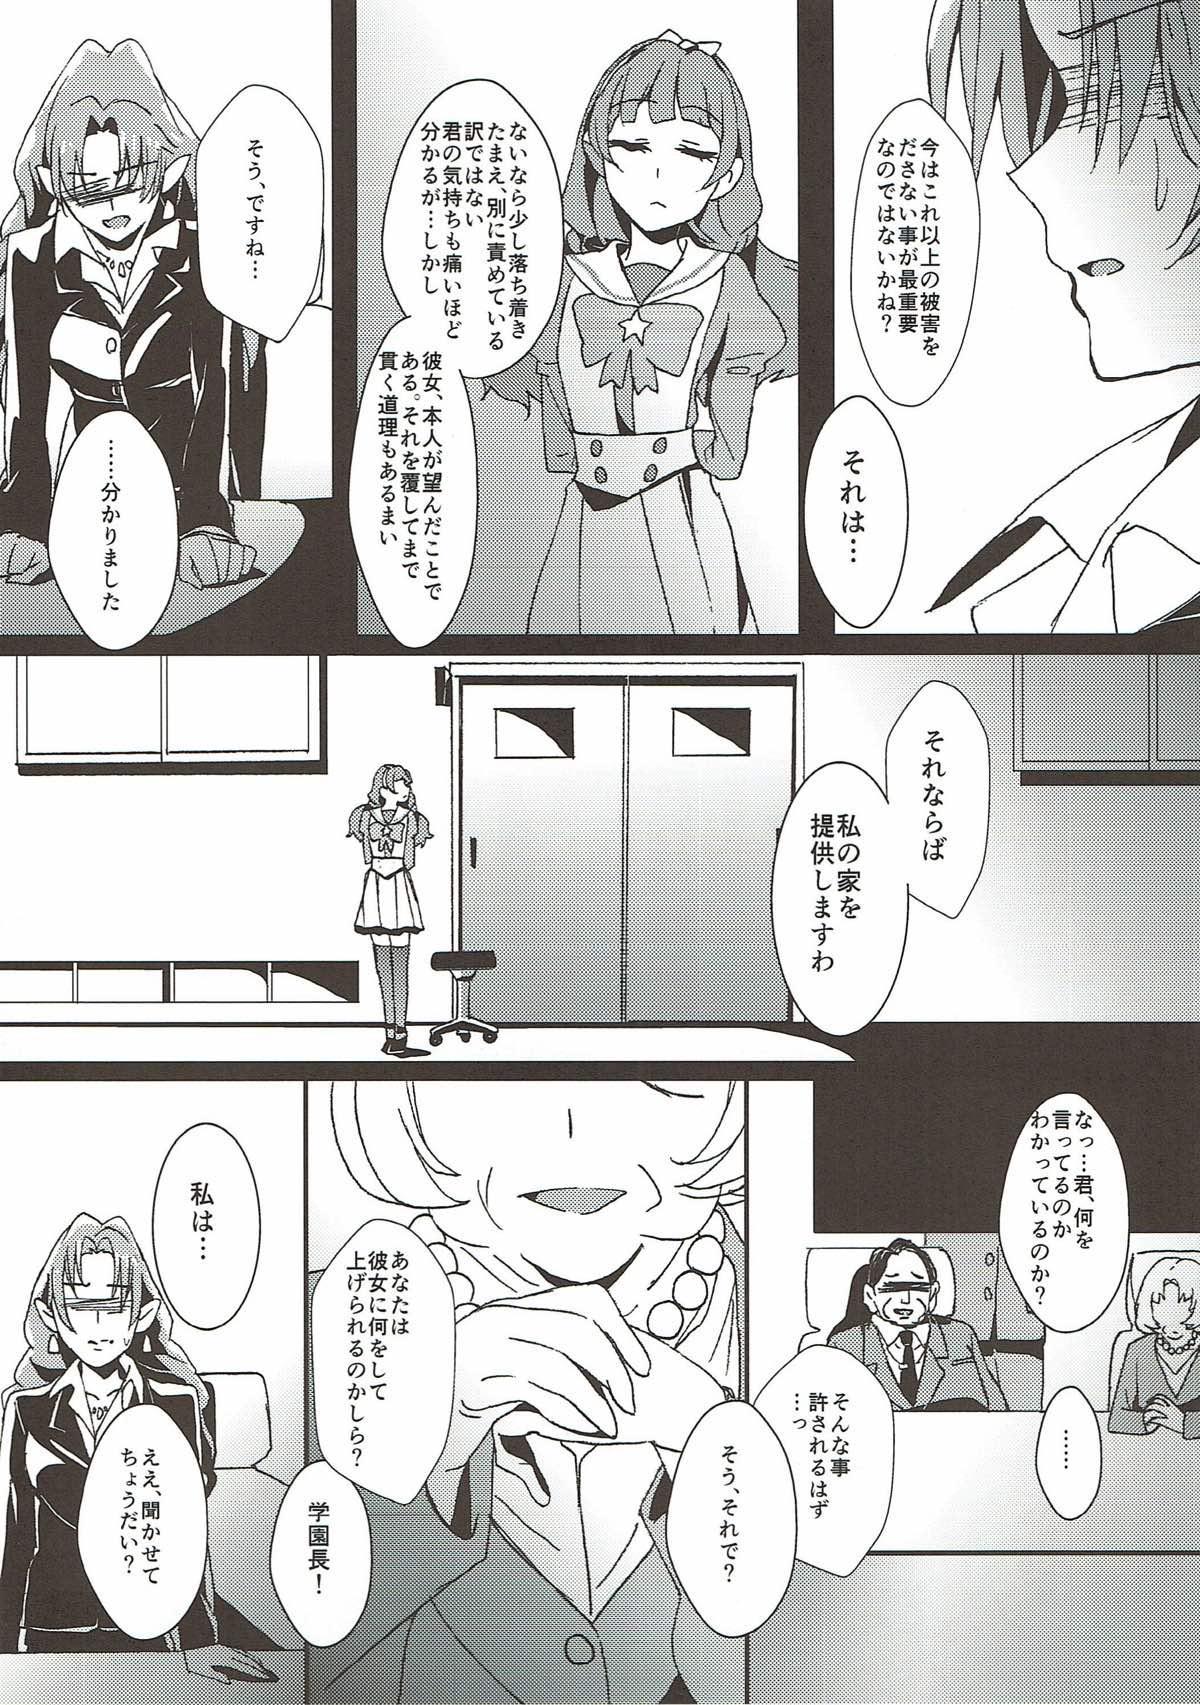 Sensei to Atashi 38